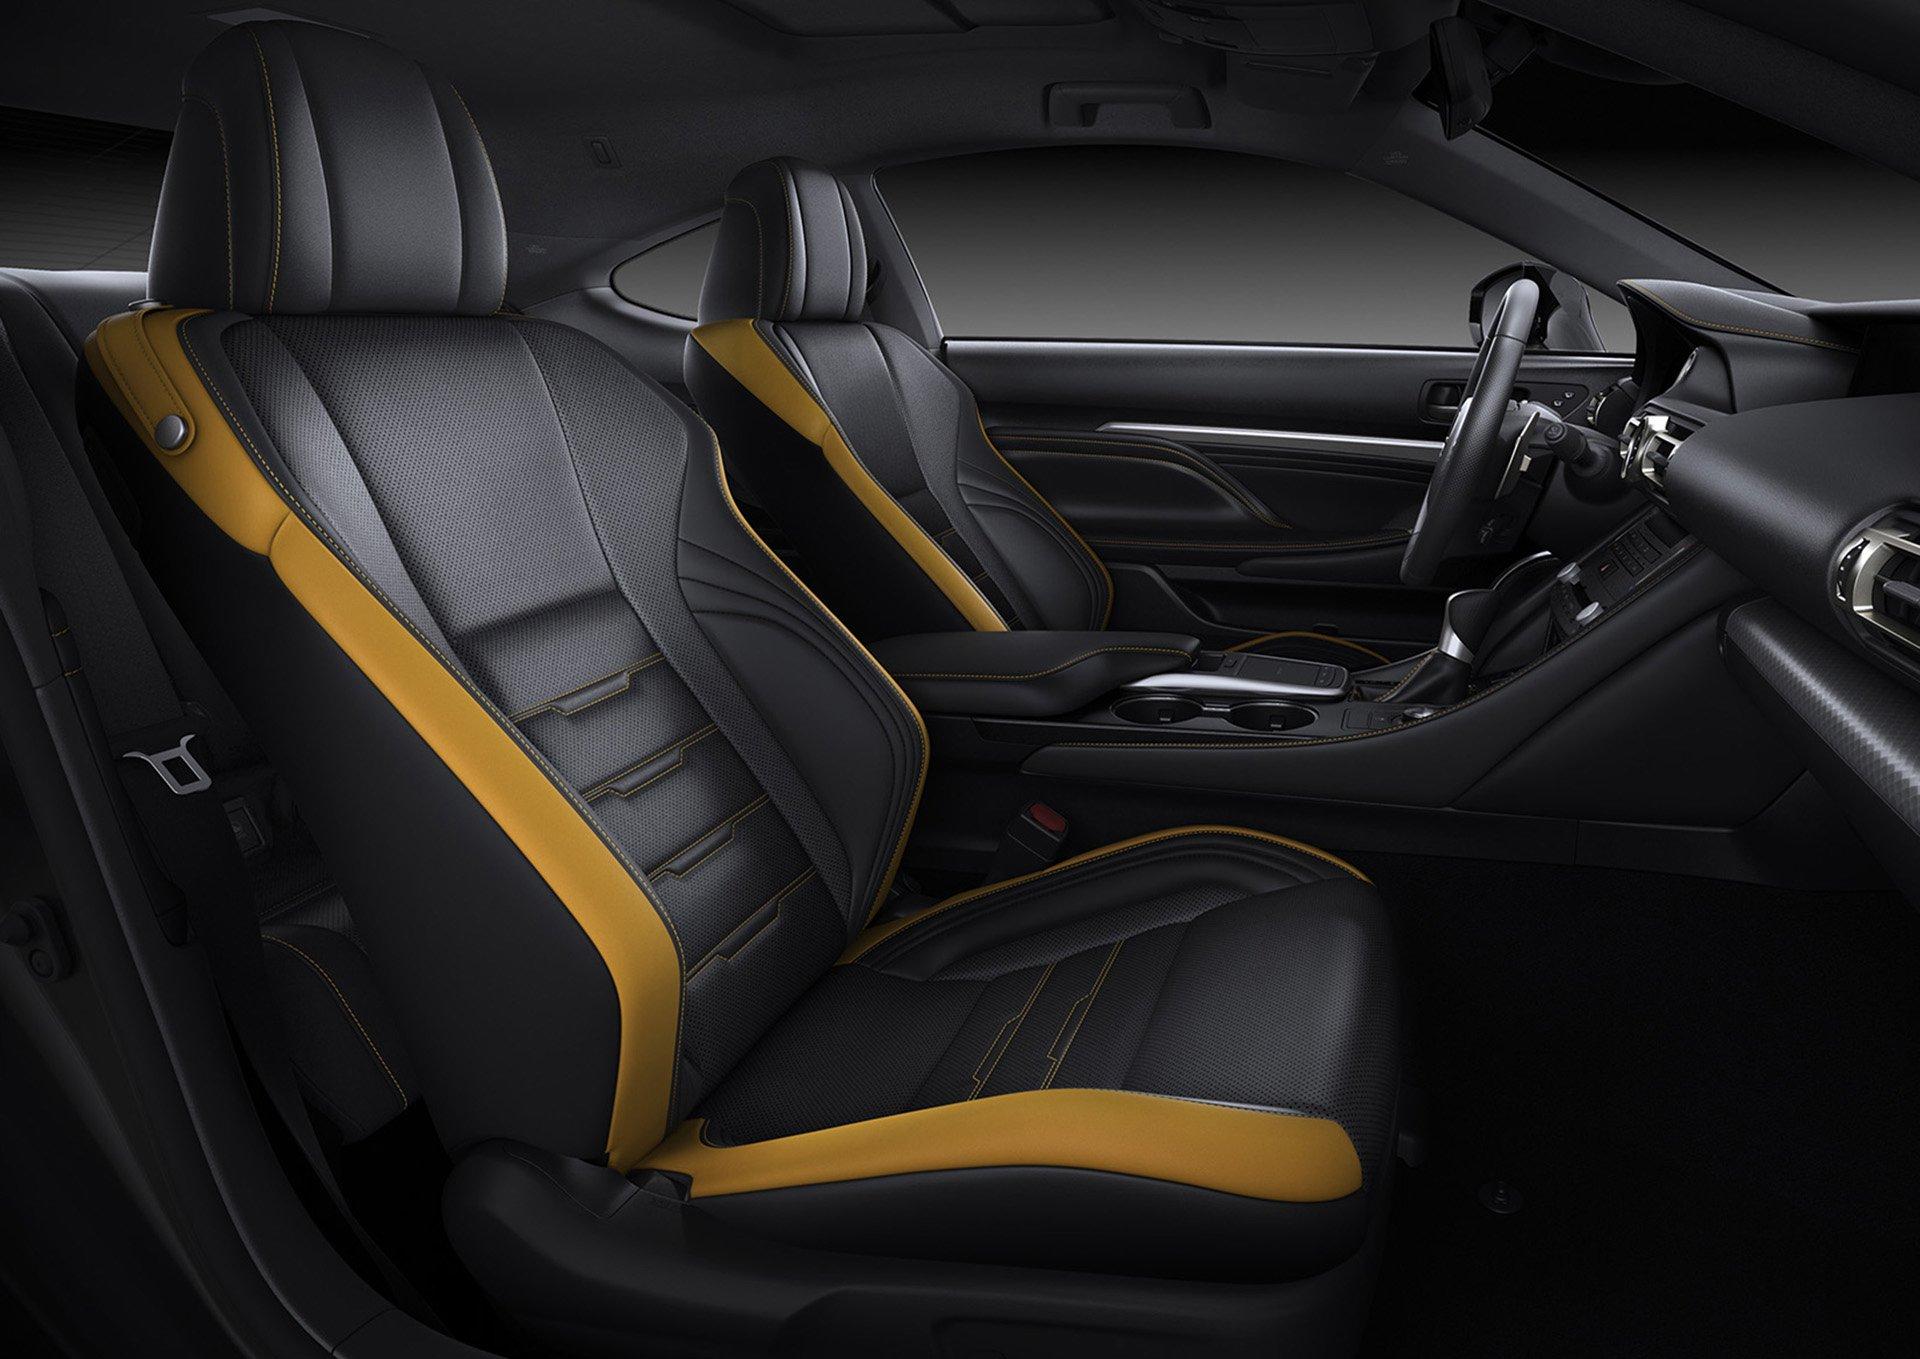 Lexus RC facelift 2019 (14)